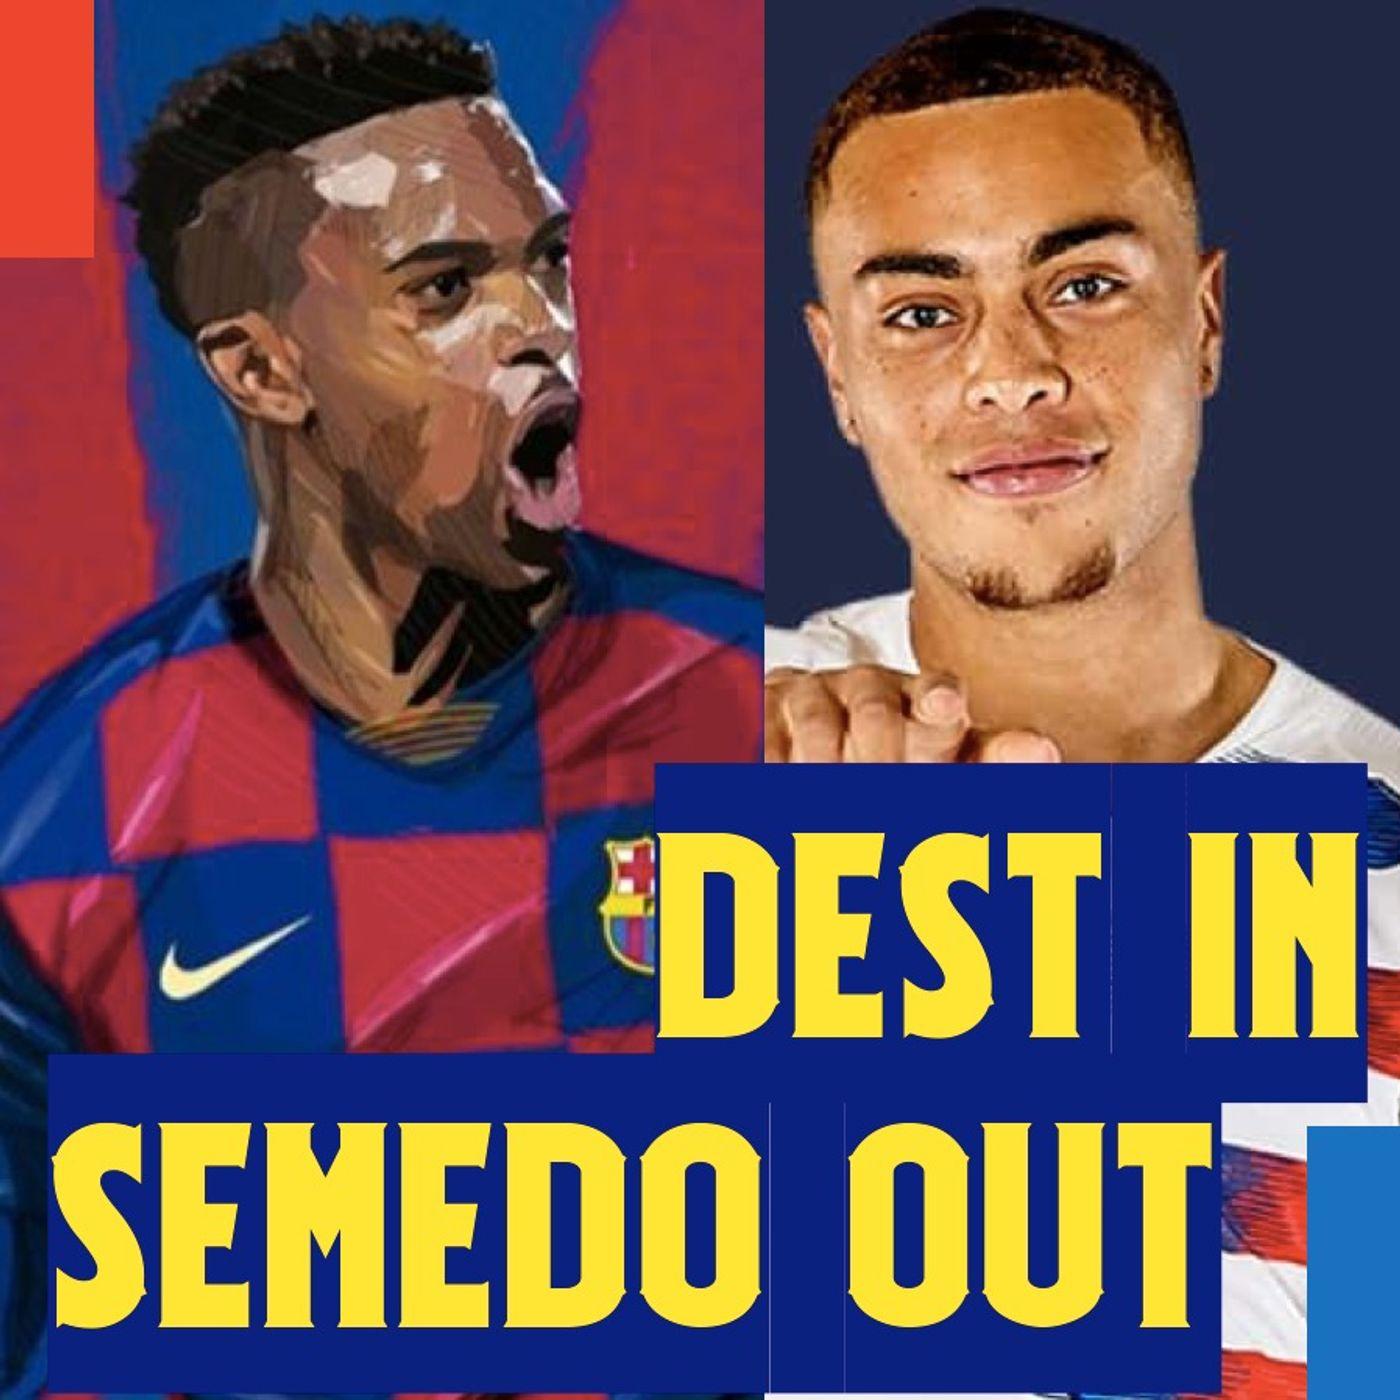 Sergiño Dest in, Semedo out? Luis Suárez return and Arthur last chance